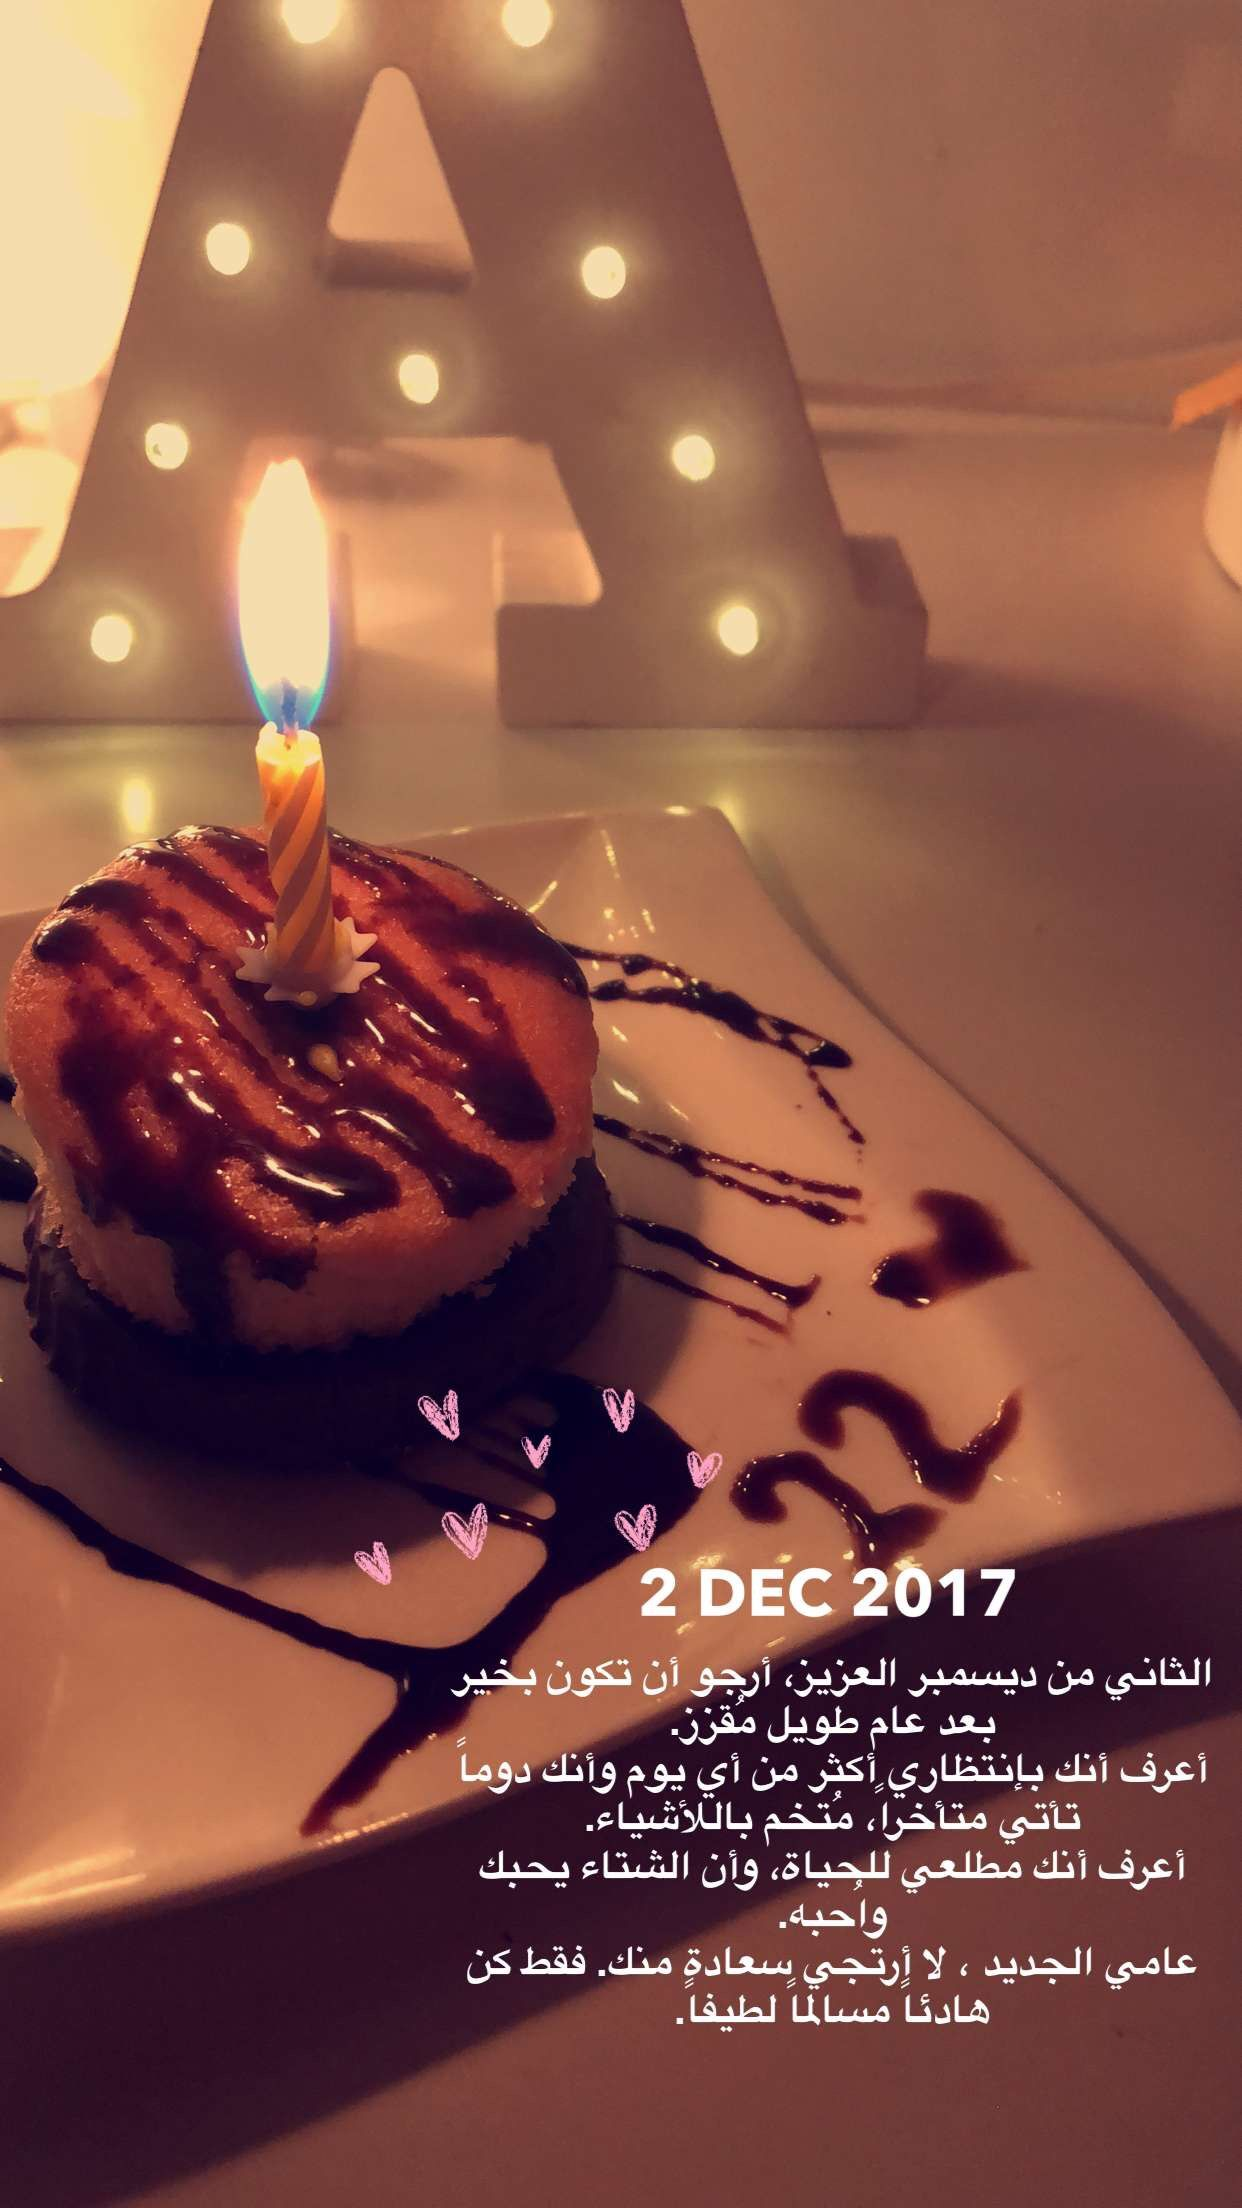 Joyeux Anniversaire En Arabe : joyeux, anniversaire, arabe, آمال, سنابيّات, Birthday, Quotes,, Happy, Cakes,, Quotes, Friend